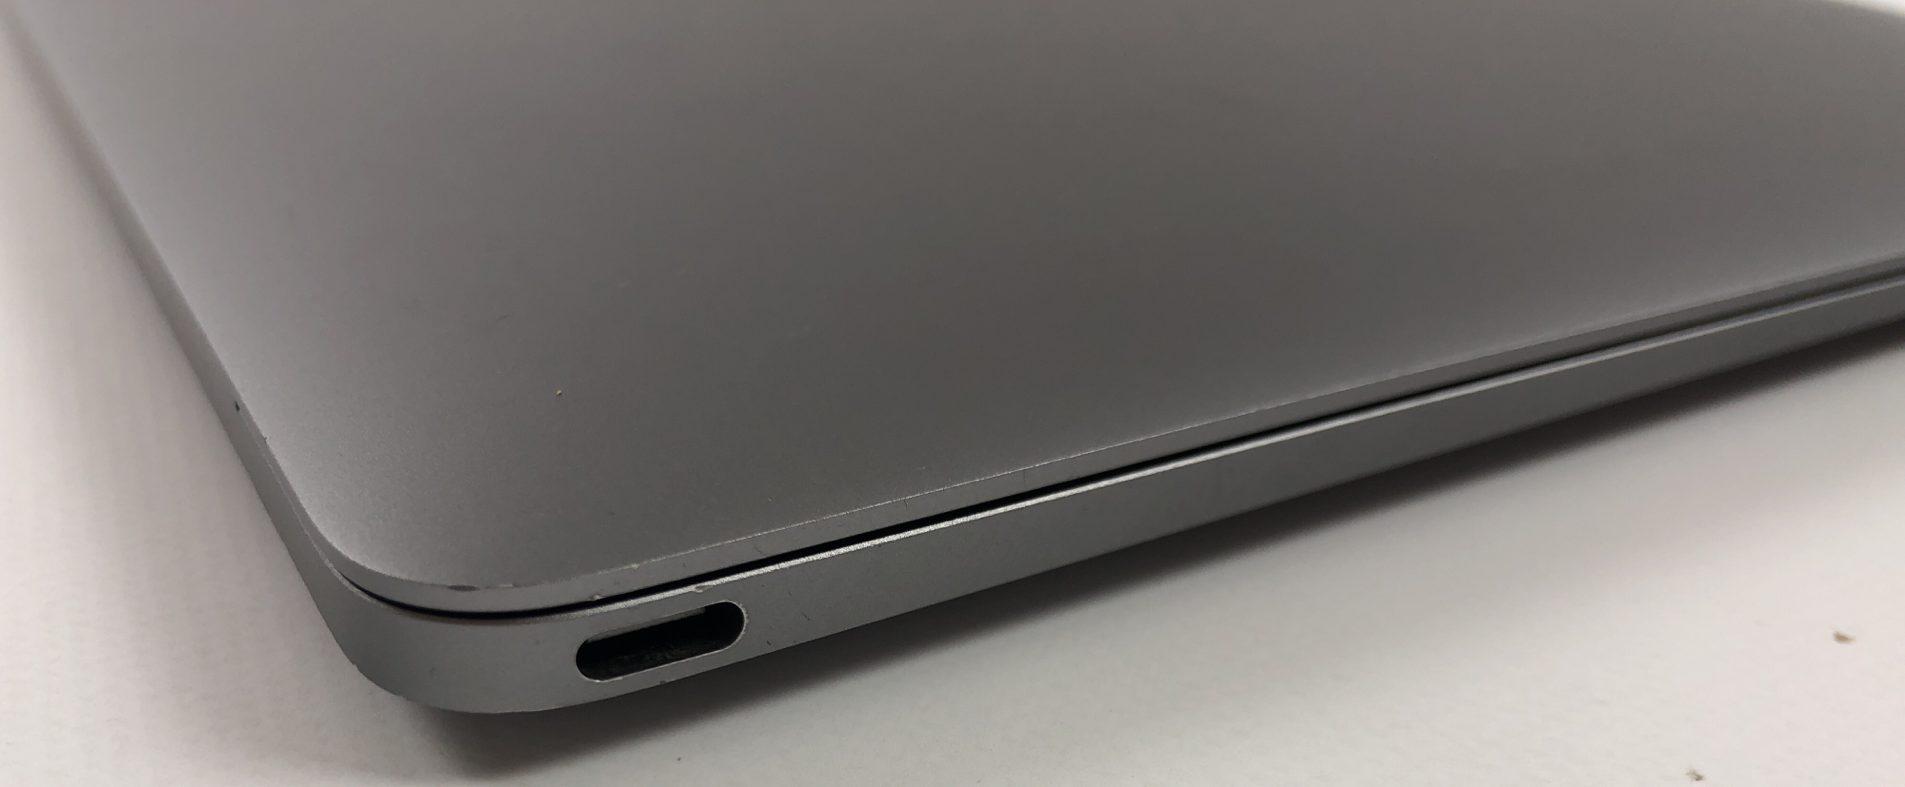 "MacBook 12"" Early 2015 (Intel Core M 1.2 GHz 8 GB RAM 512 GB SSD), Space Gray, Intel Core M 1.2 GHz, 8 GB RAM, 512 GB SSD, image 3"